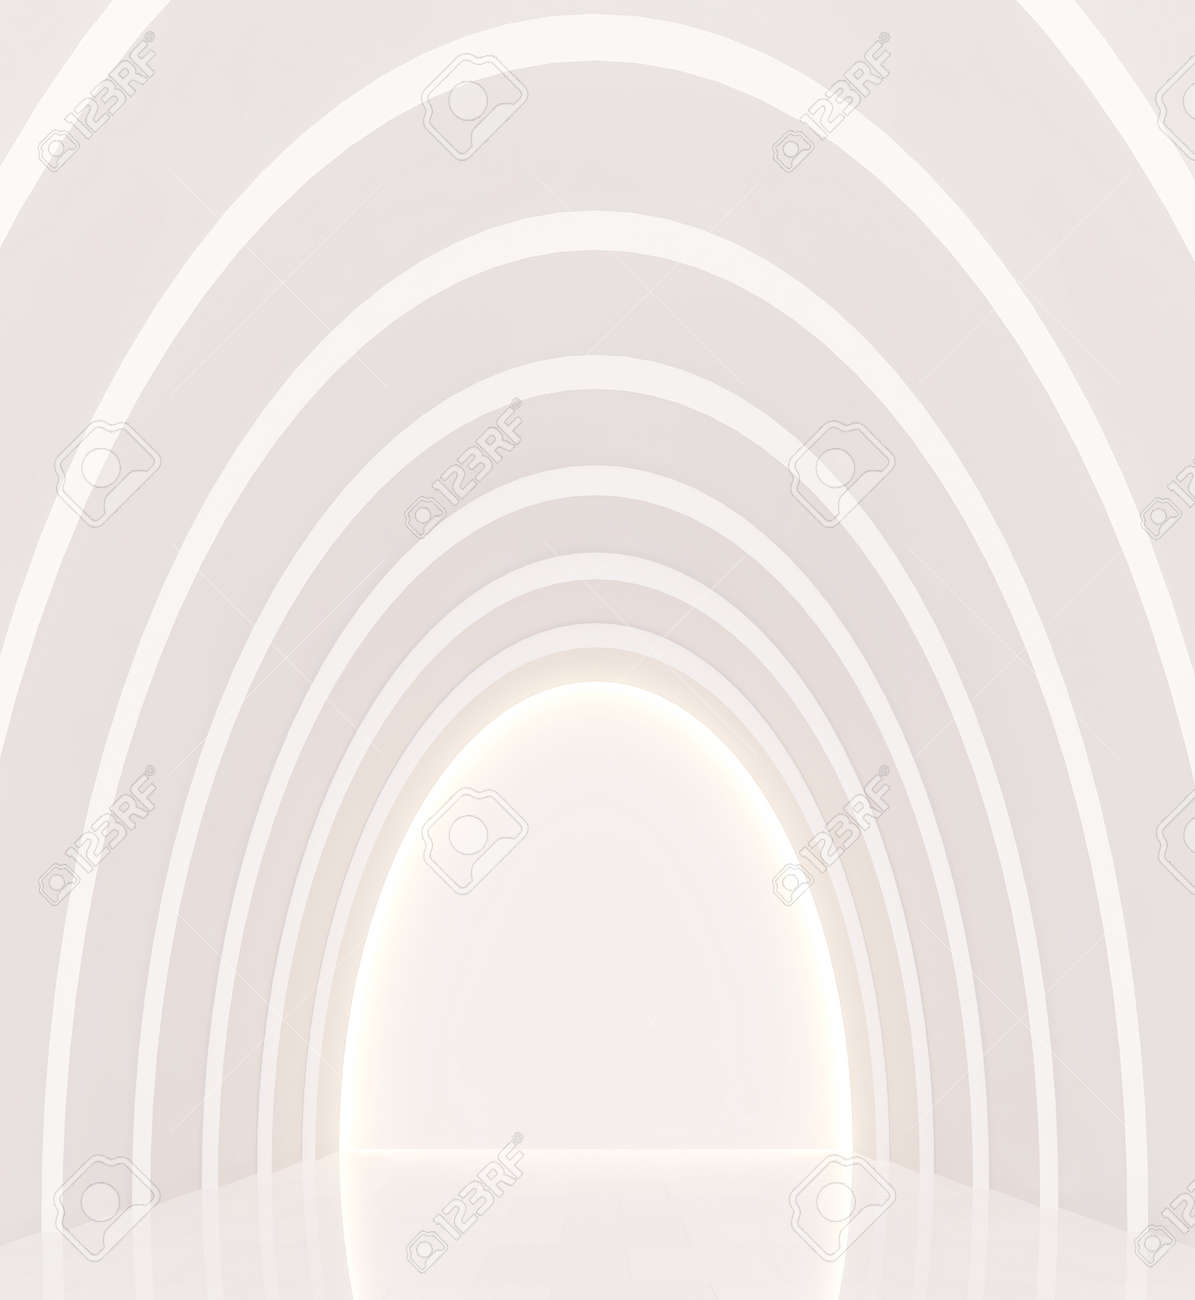 Leere Weiße Raum Moderne Raum Innenraum 3D-Rendering Image.a Kurve ...